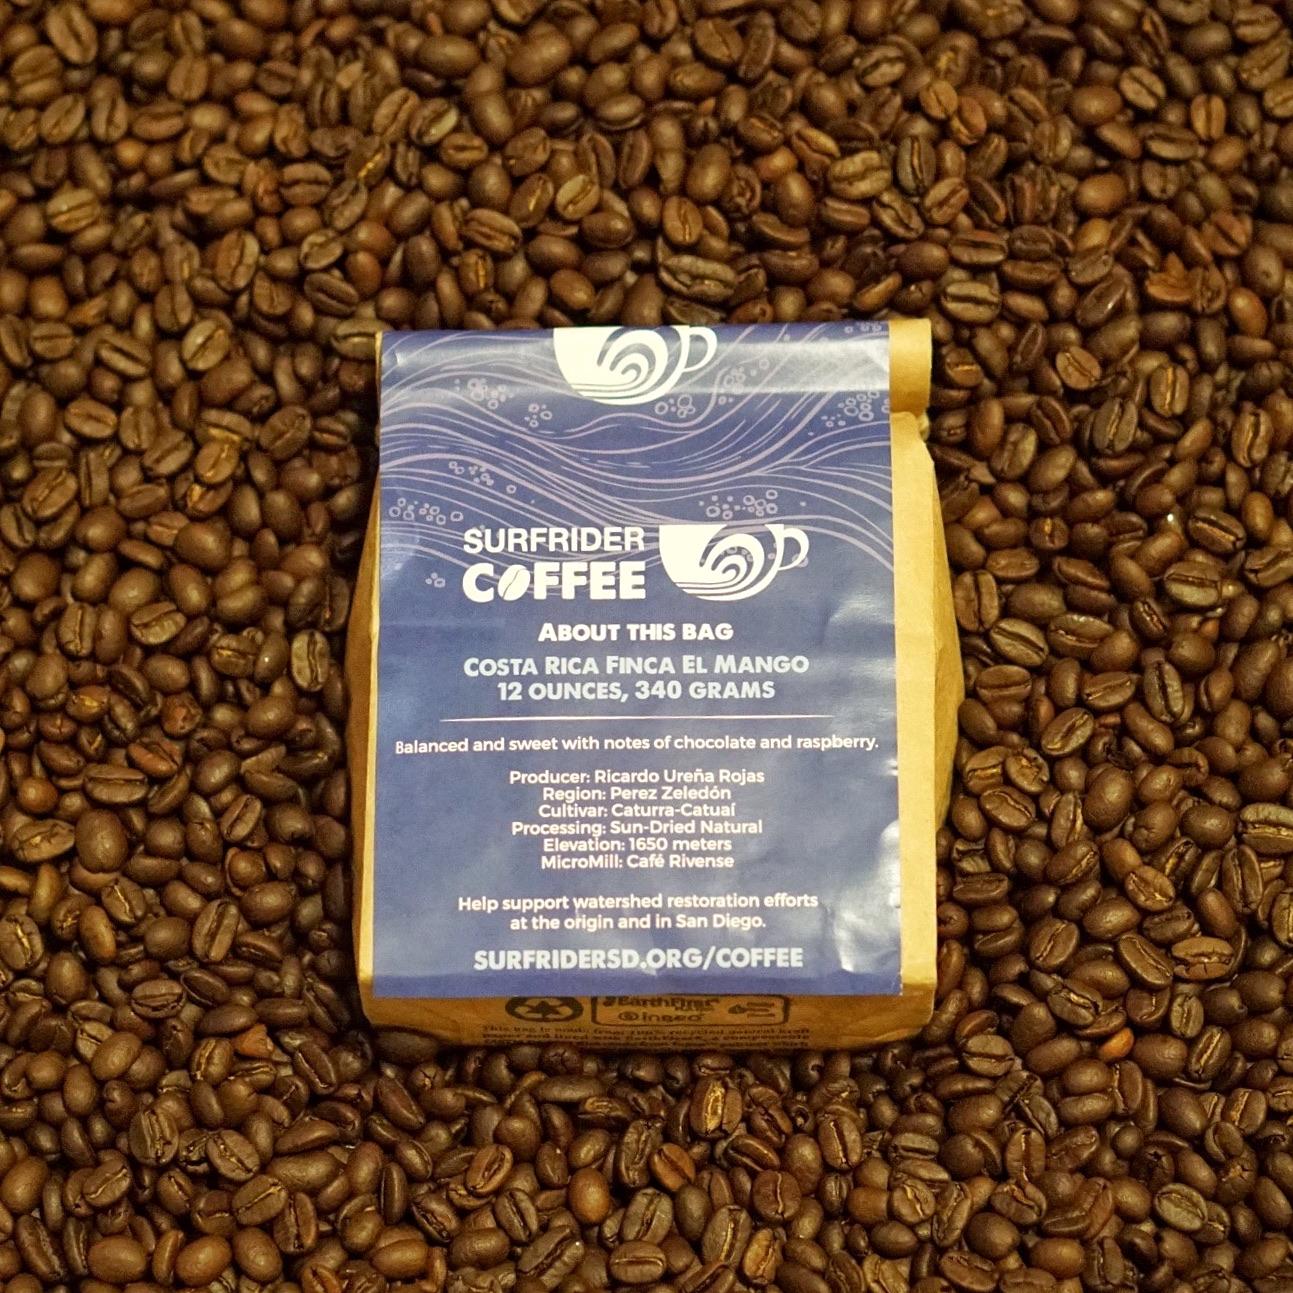 Surfrider Coffee at Caffè Calabria